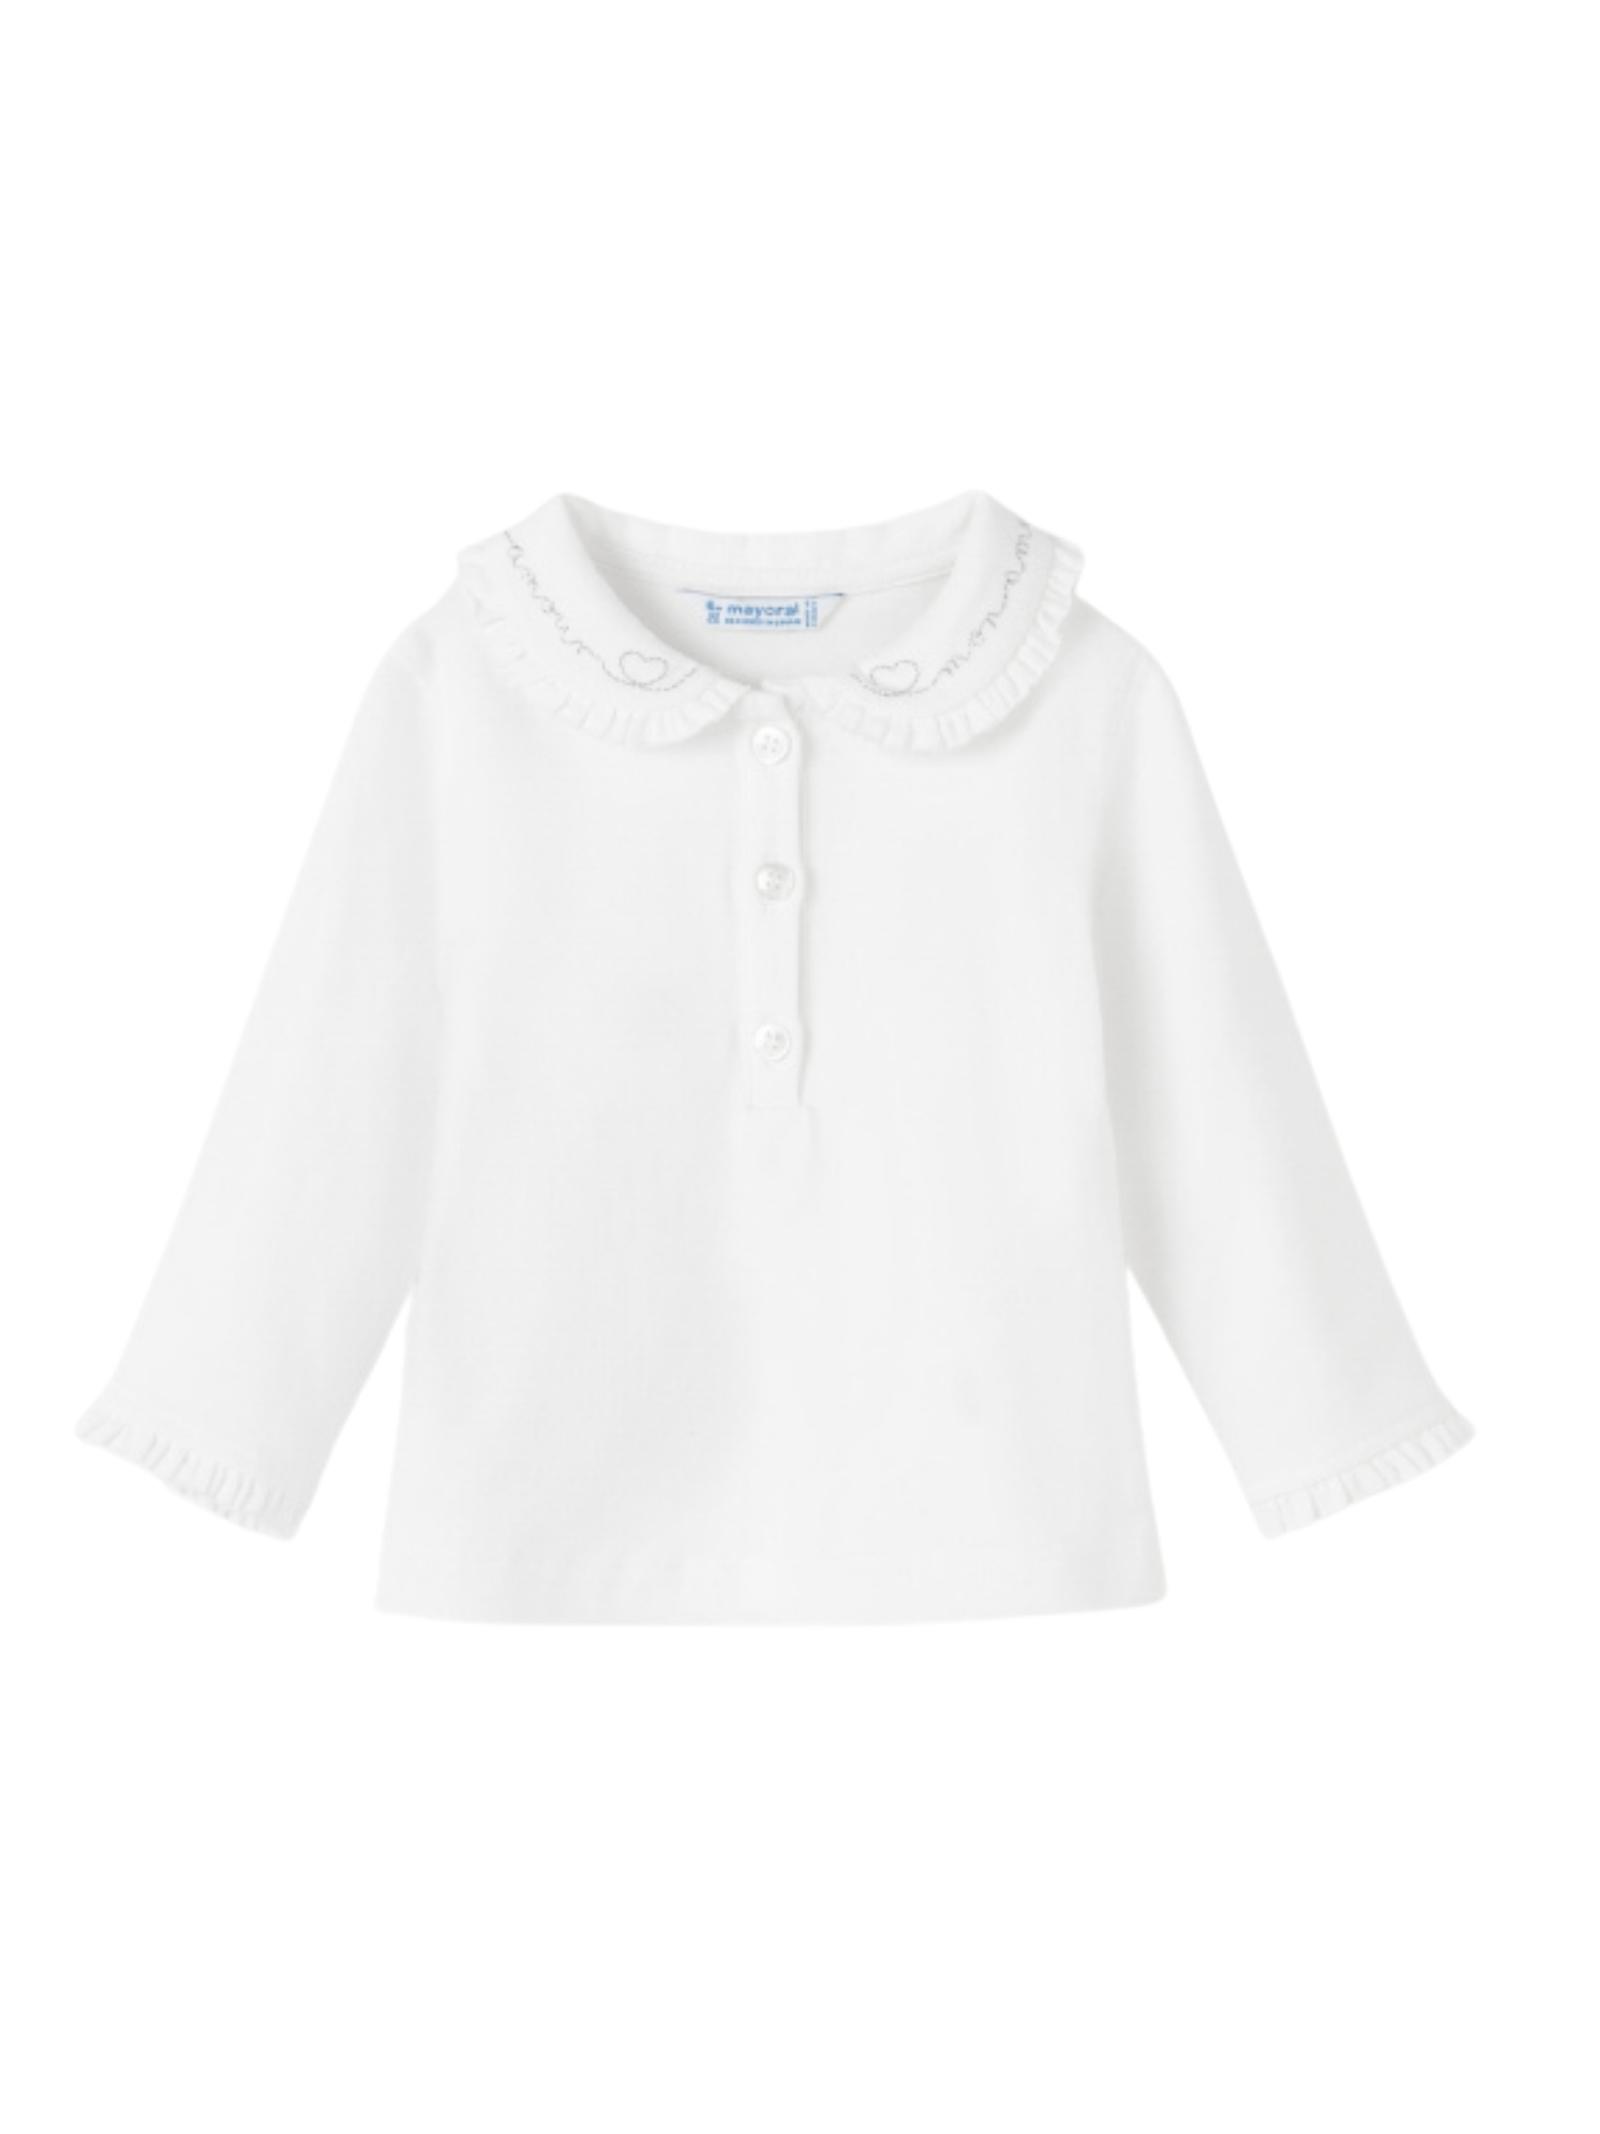 Polo Basic Bambina MAYORAL | Polo | 104080